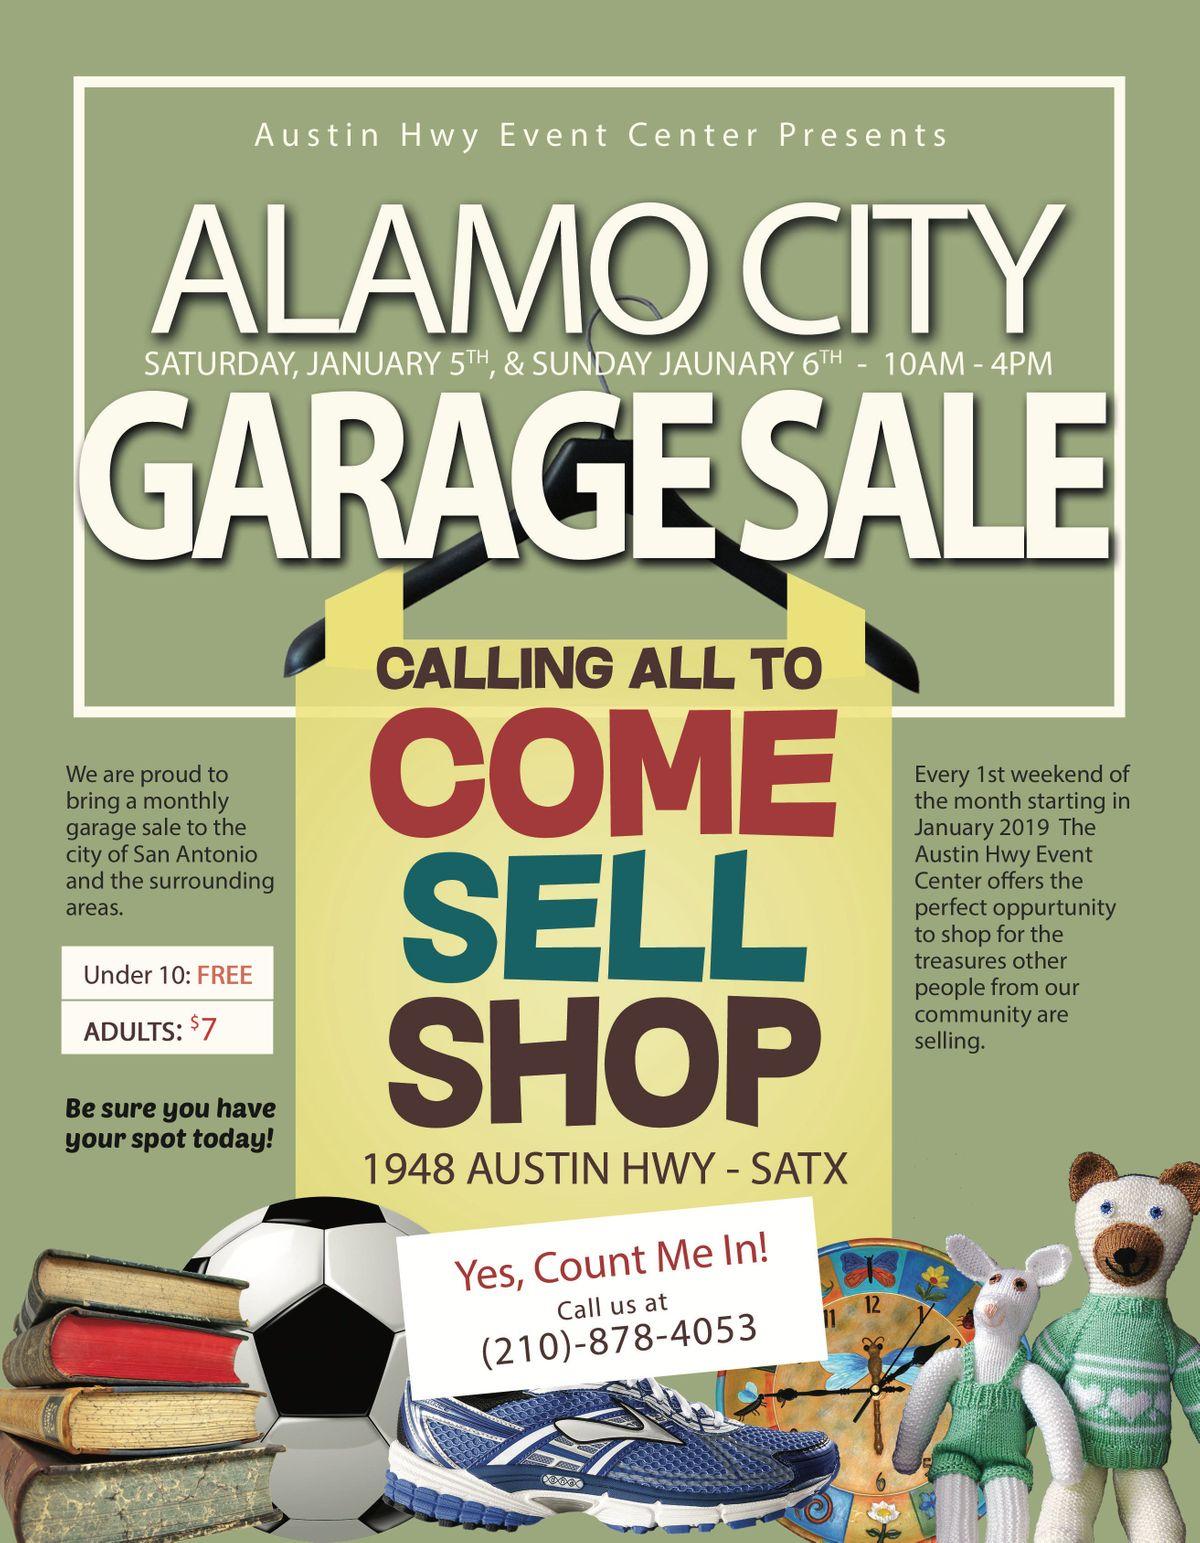 Alamo City Garage Sale At Austin Hwy Event Center San Antonio